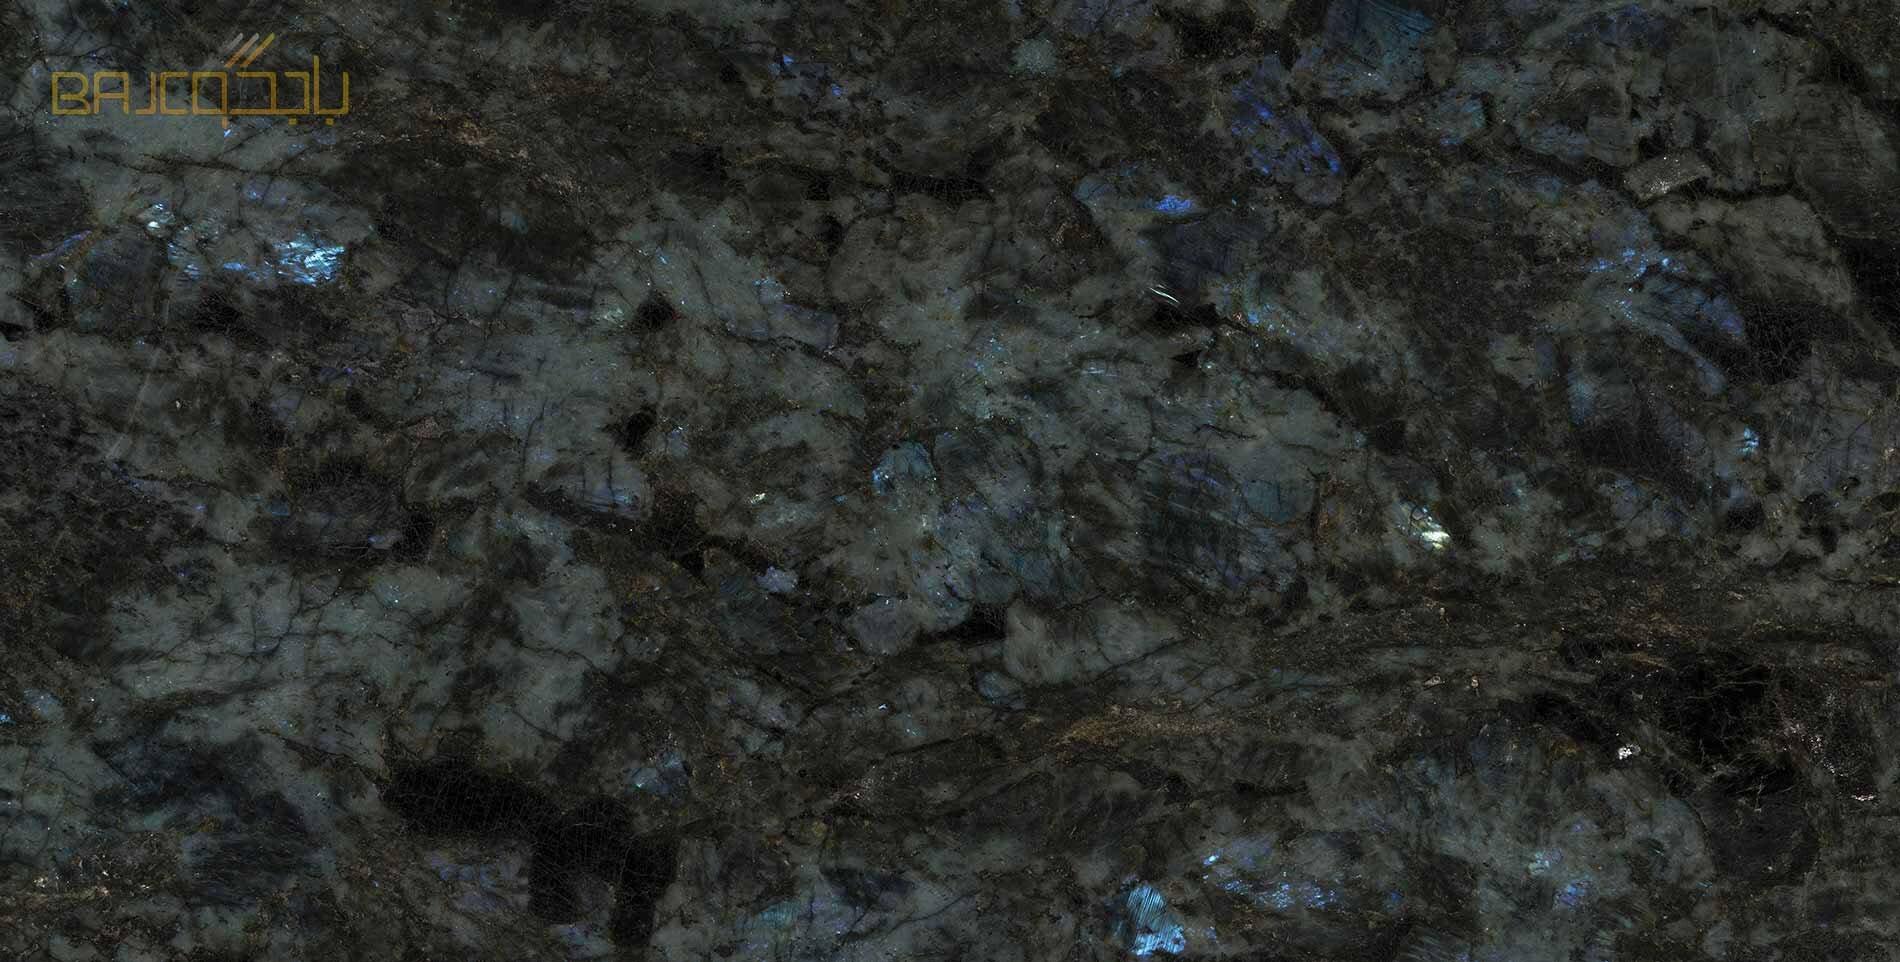 lemurian-ليموريان